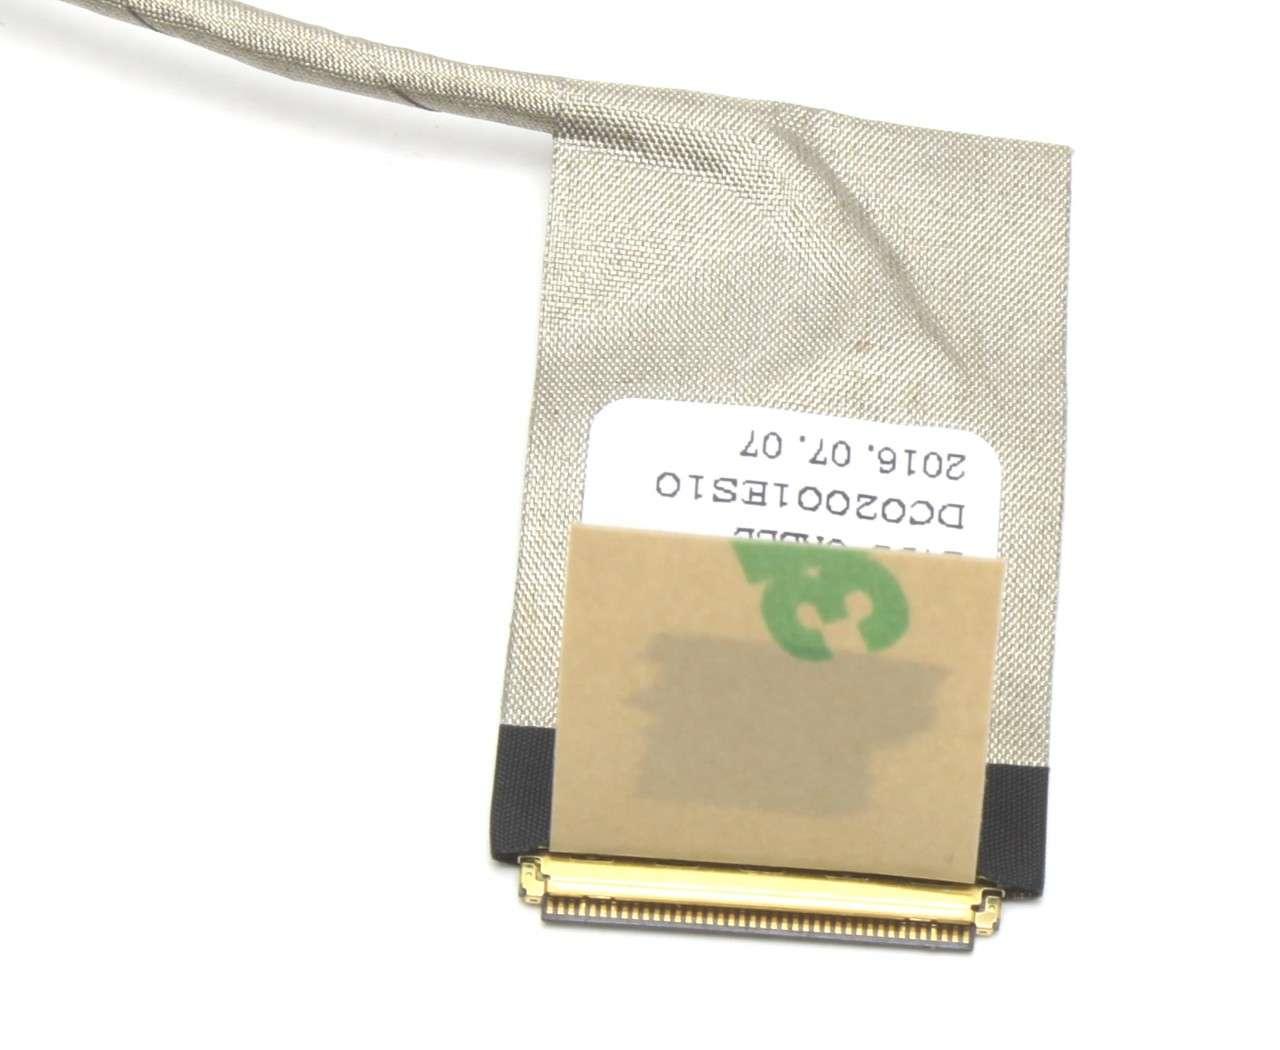 Cablu video LVDS Lenovo G585 Part Number DC02001ES10 imagine powerlaptop.ro 2021